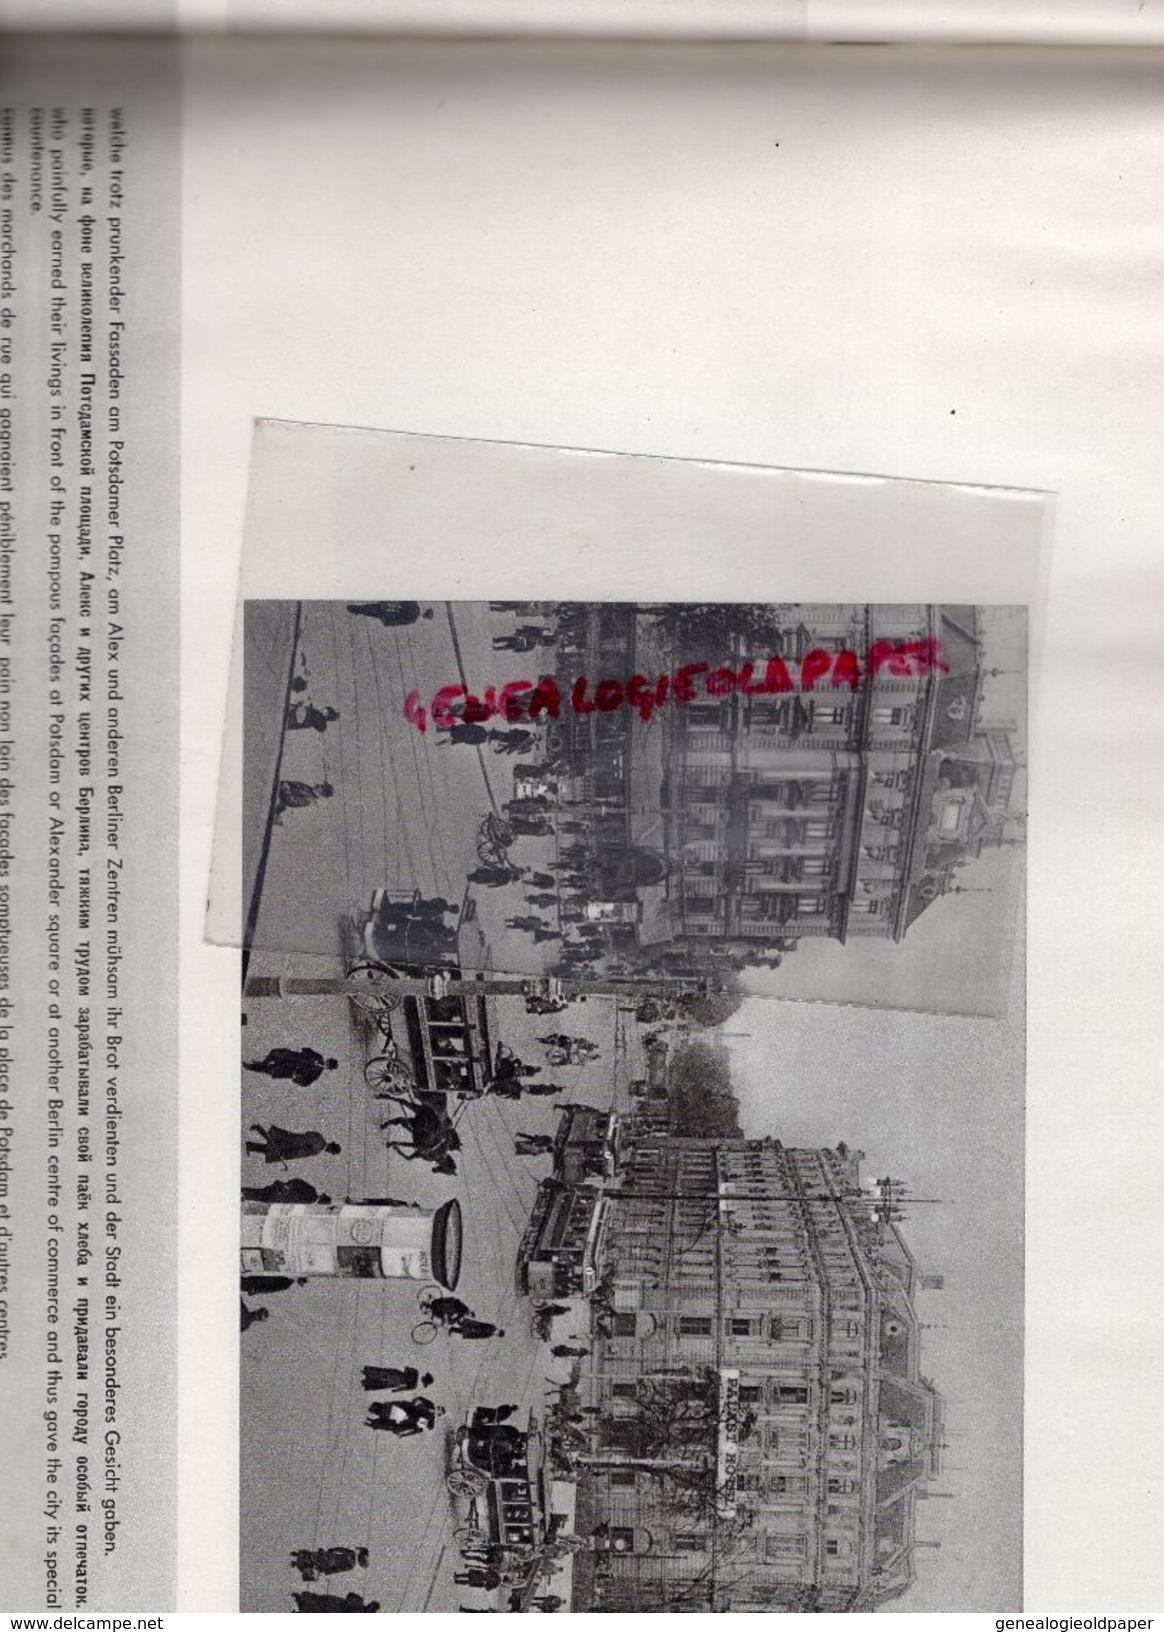 ALLEMAGNE - BERLIN- III WELTFESTSPIELE DER JUGEND UND STUDENTEN FUR DEN FRIEDEN 1951-EBERT PREFET -CENTRE DE LA PAIX - Bücher, Zeitschriften, Comics